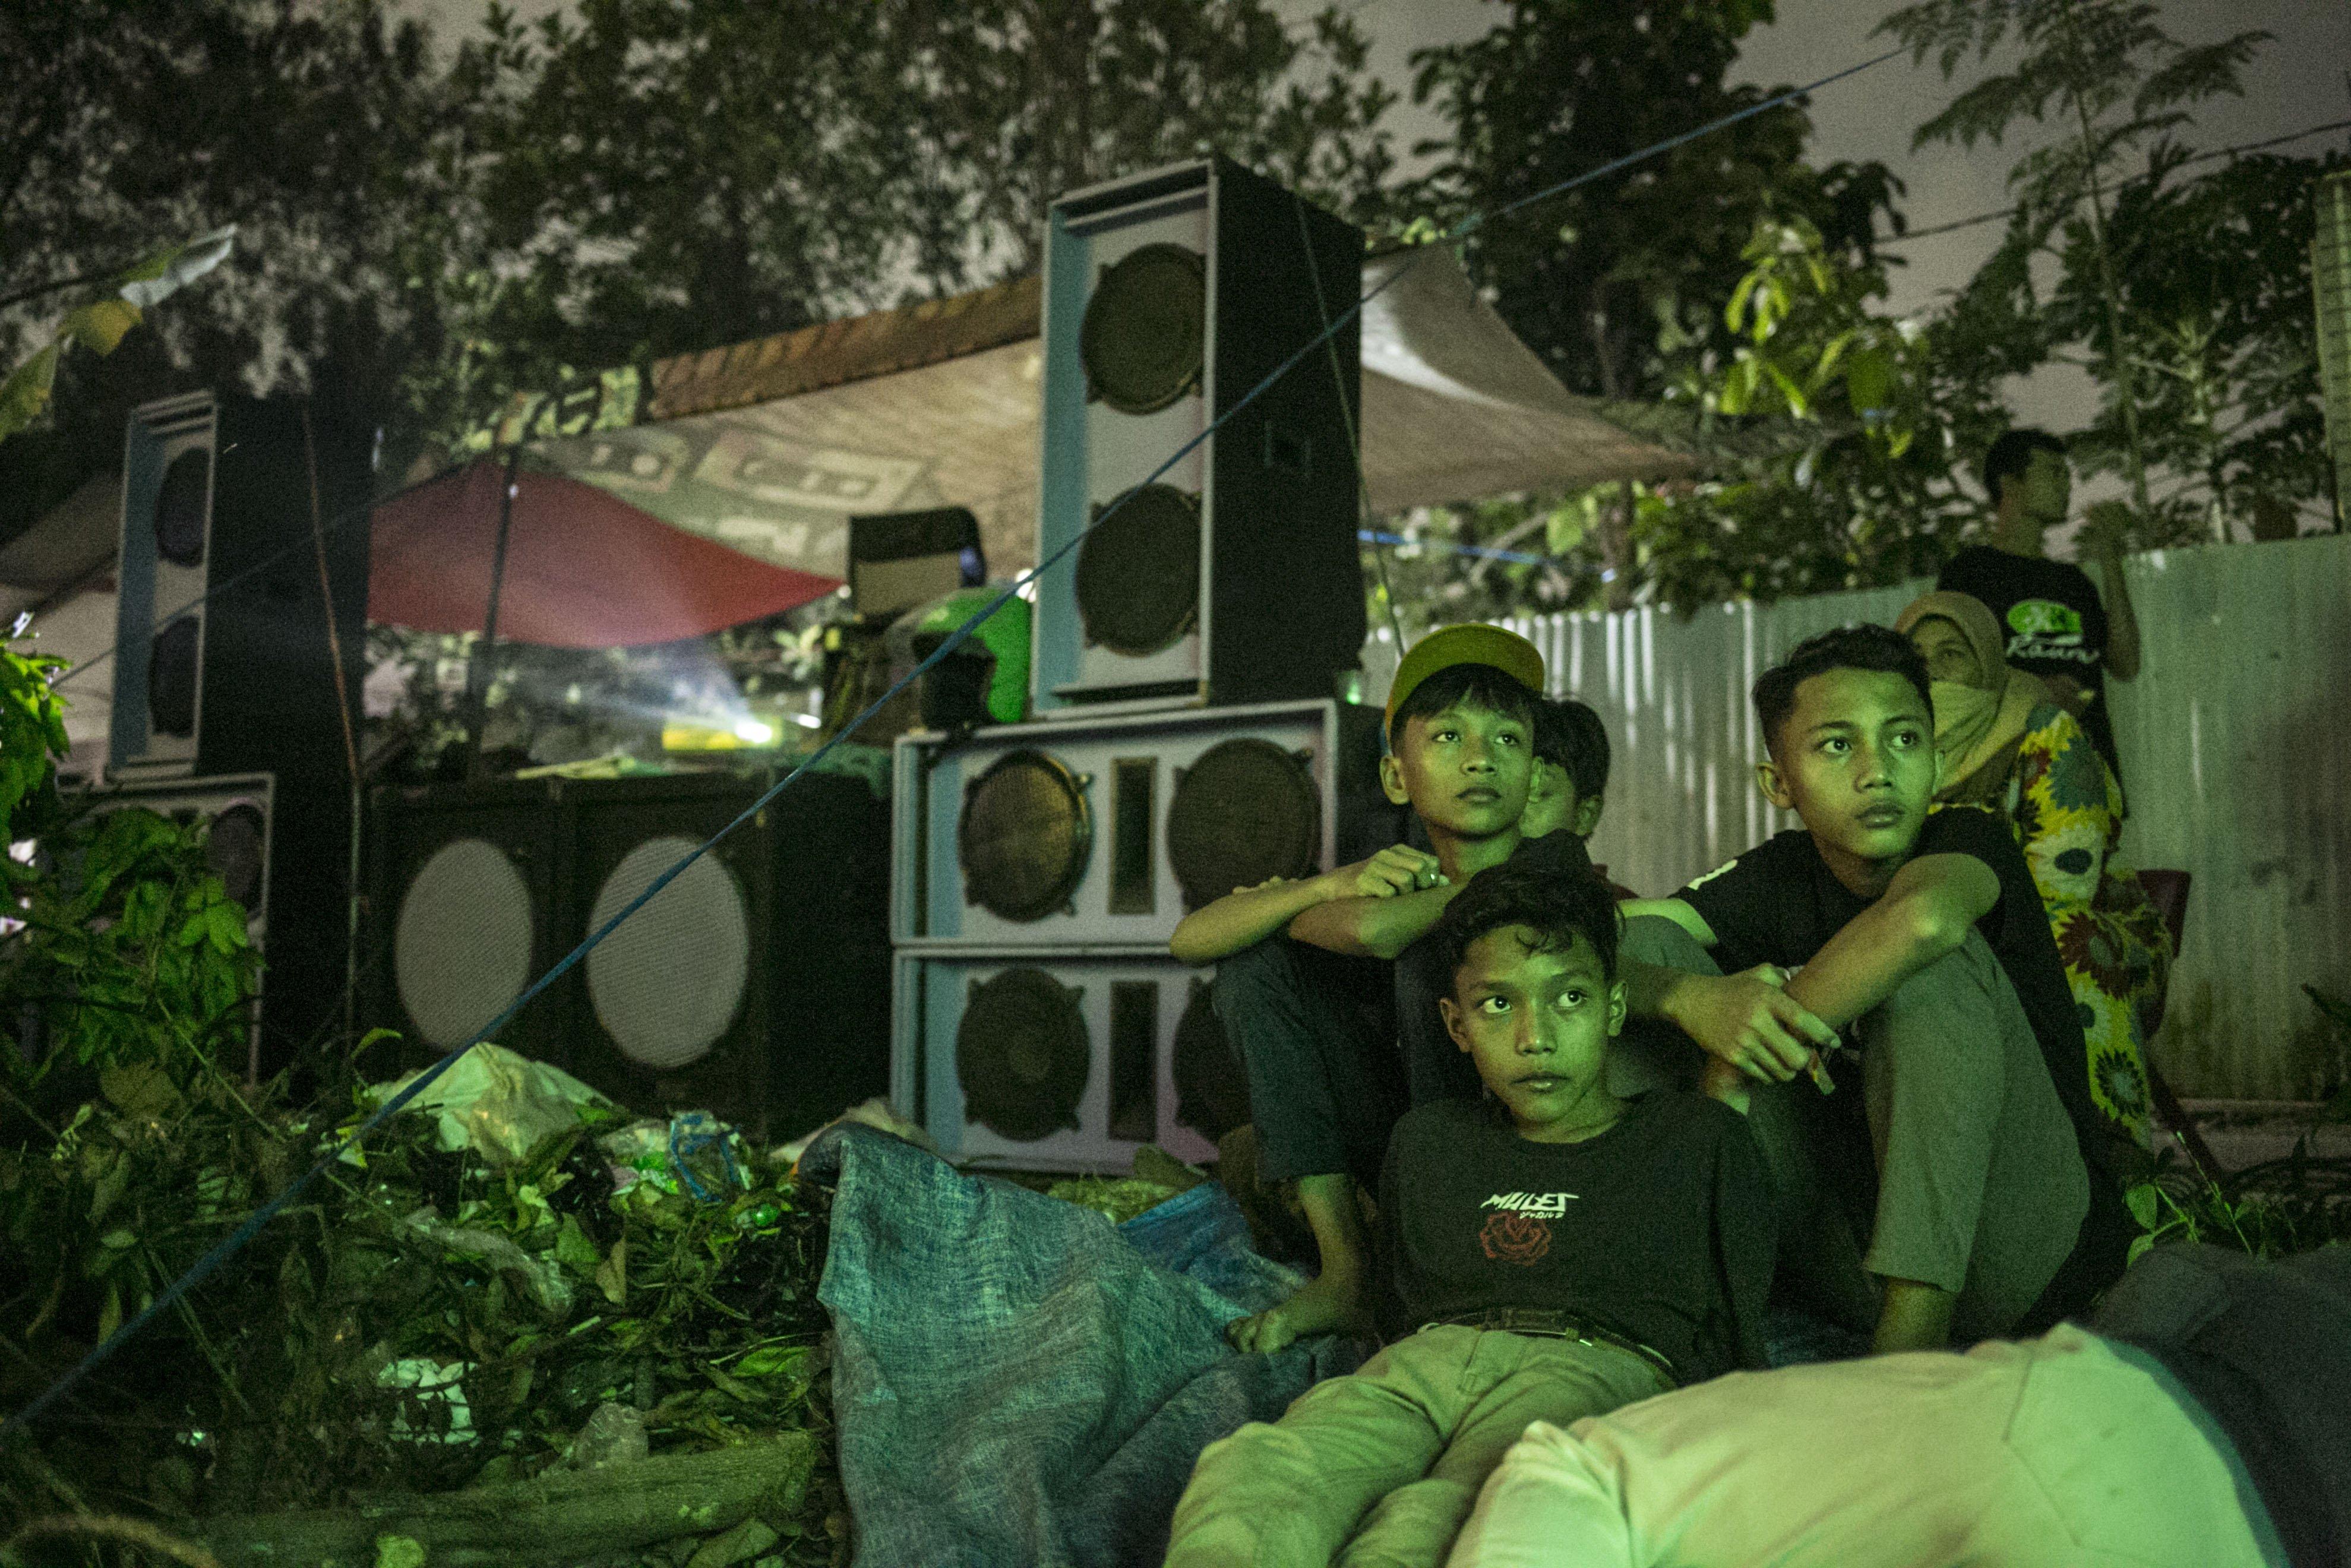 Warga menonton filim di layar tancap Kawasan Sawangan, Depok, Jawa Barat, Sabtu (11/7/2020).